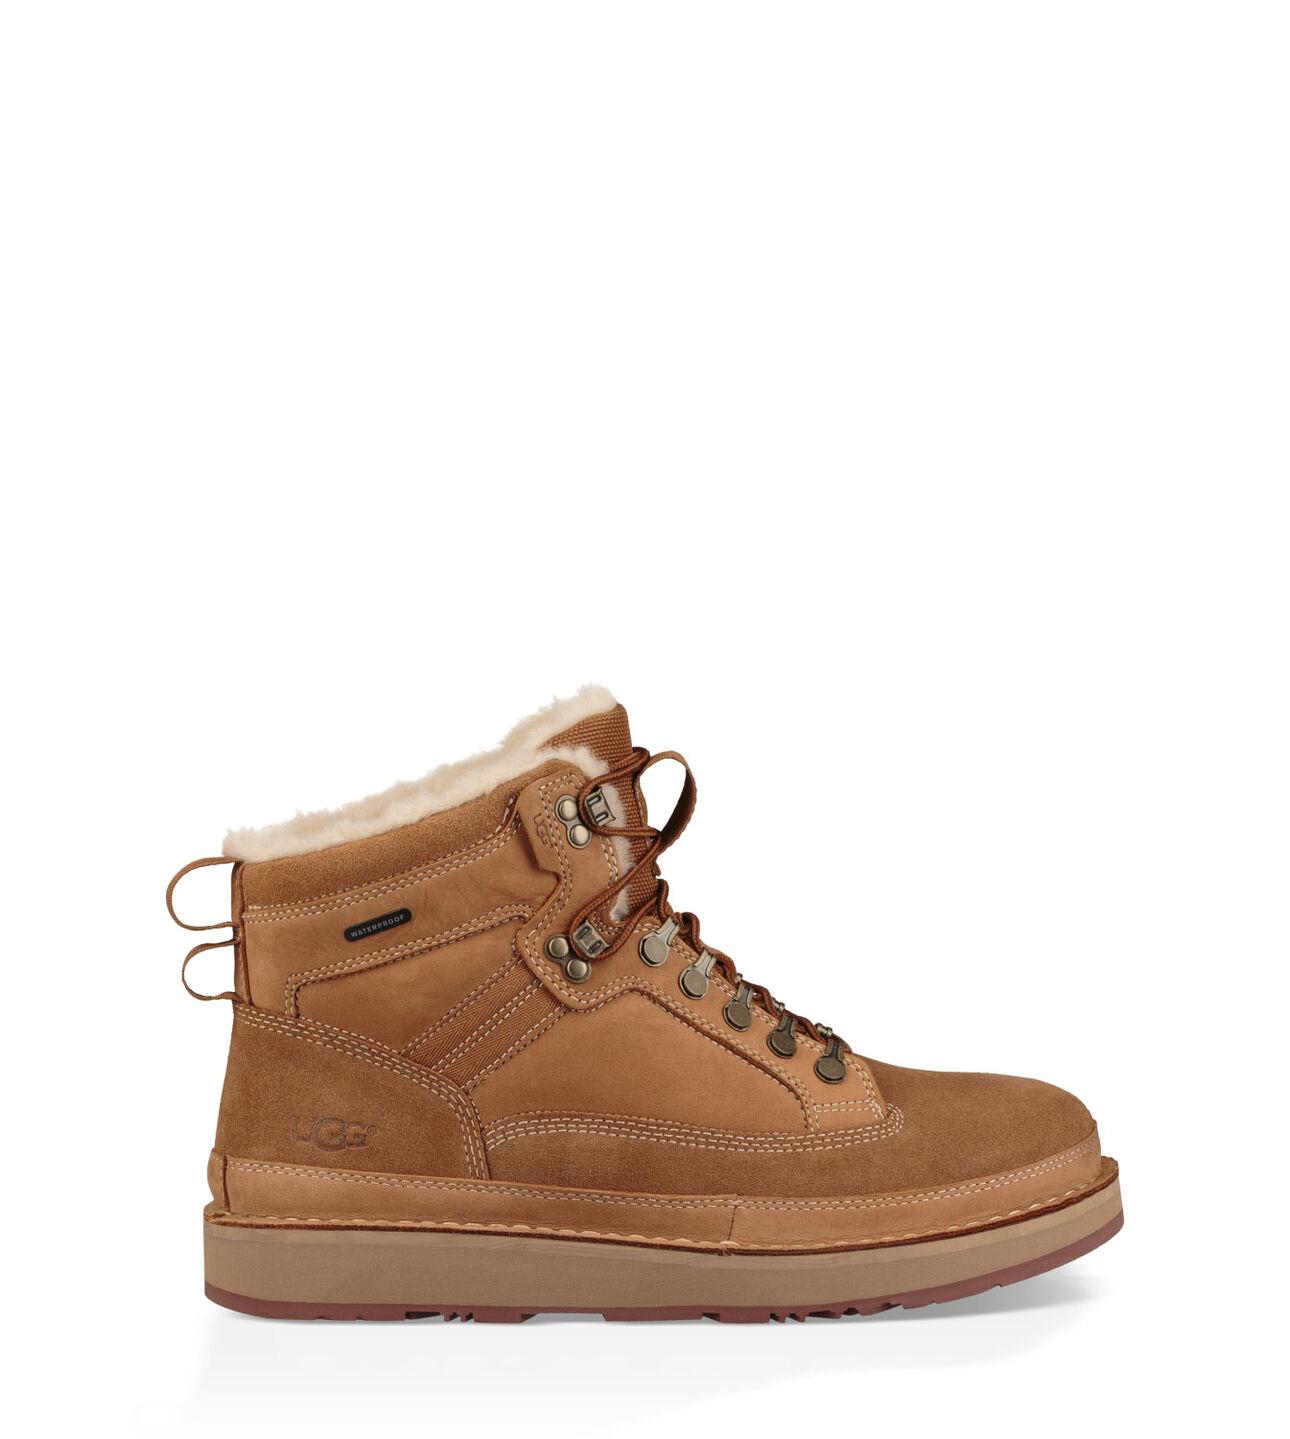 a912e59613b Avalanche Hiker Boot